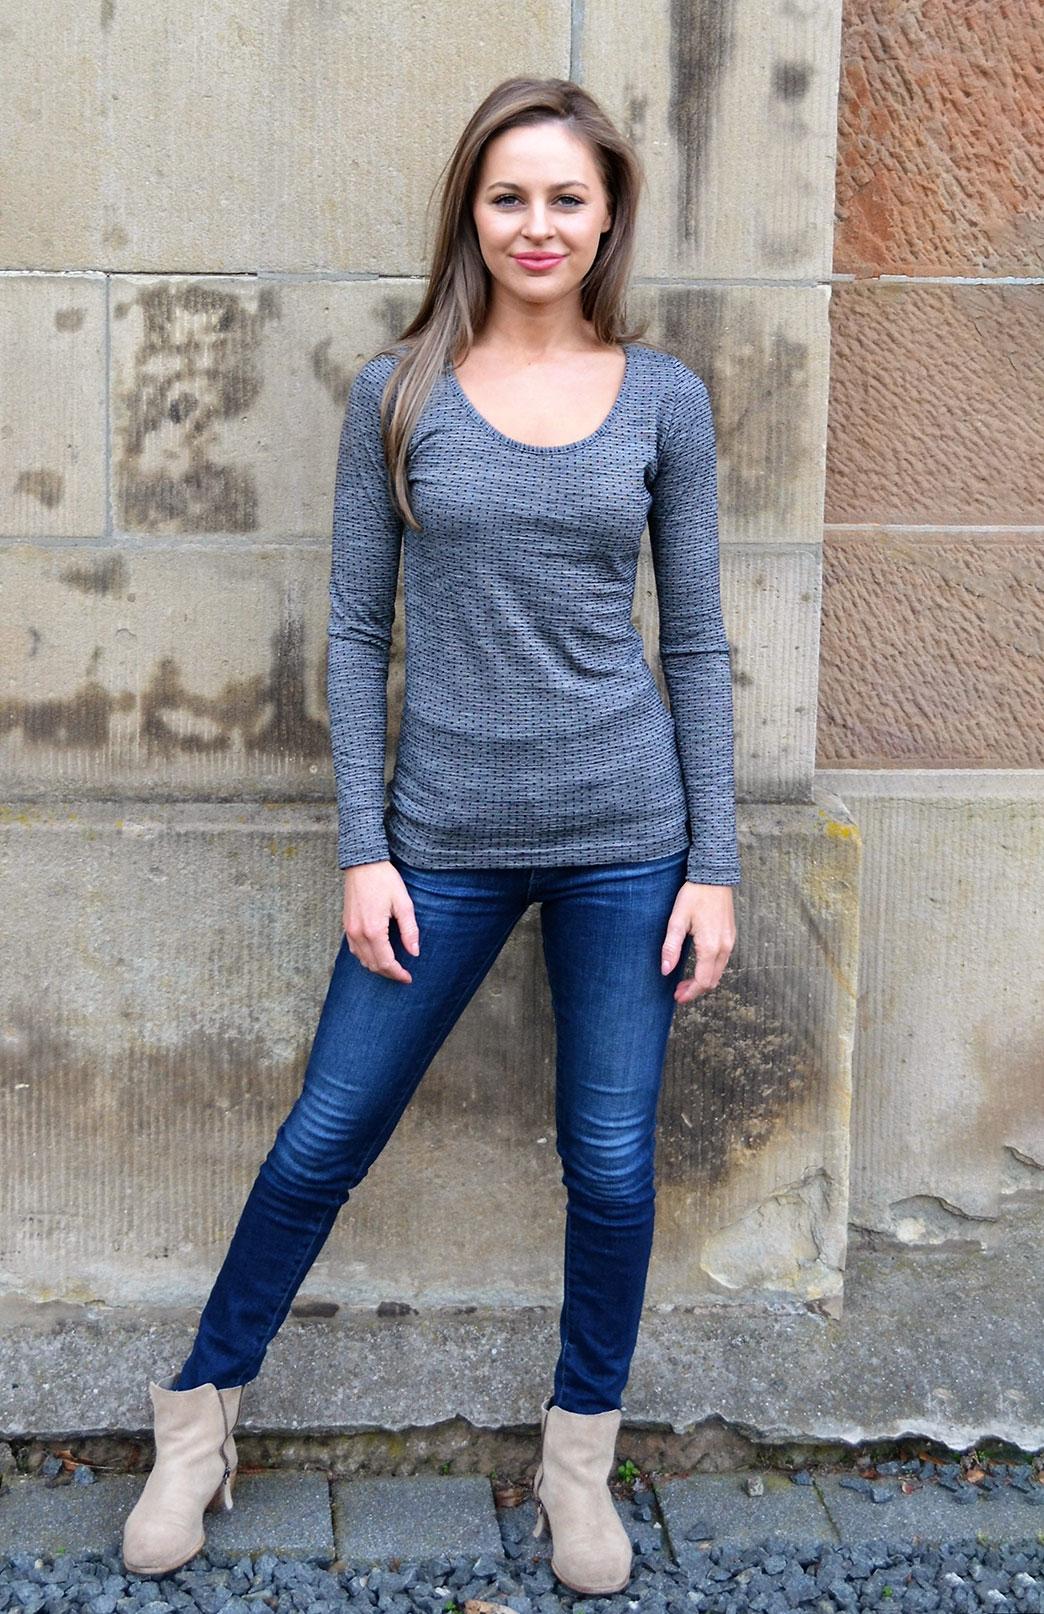 Scoop Neck Top - Patterned - Women's Black Grey Spot Patterned Merino Wool Long Sleeved Thermal Top with Scoop Neckline - Smitten Merino Tasmania Australia